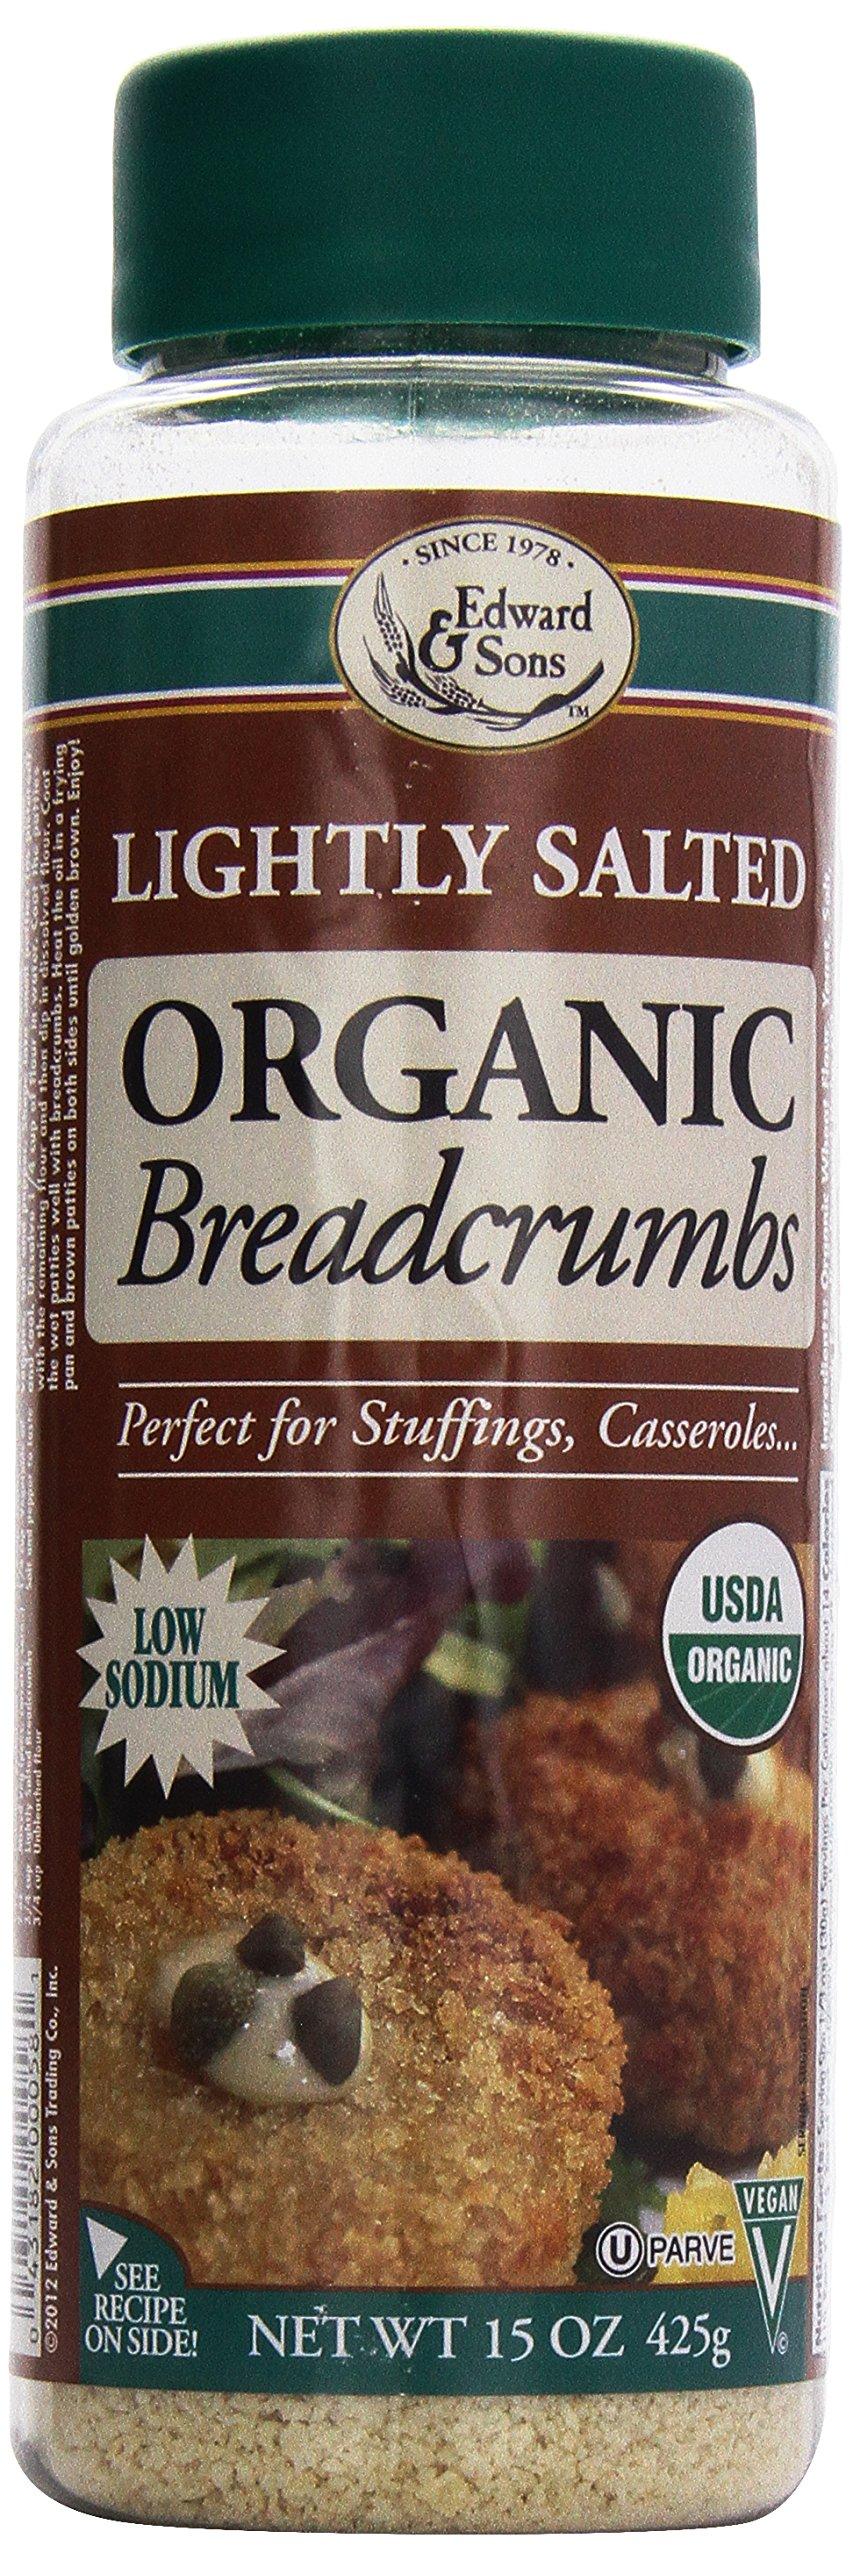 Edward & Sons Organic Bread Crumbs, Light Salt, 15 Ounce